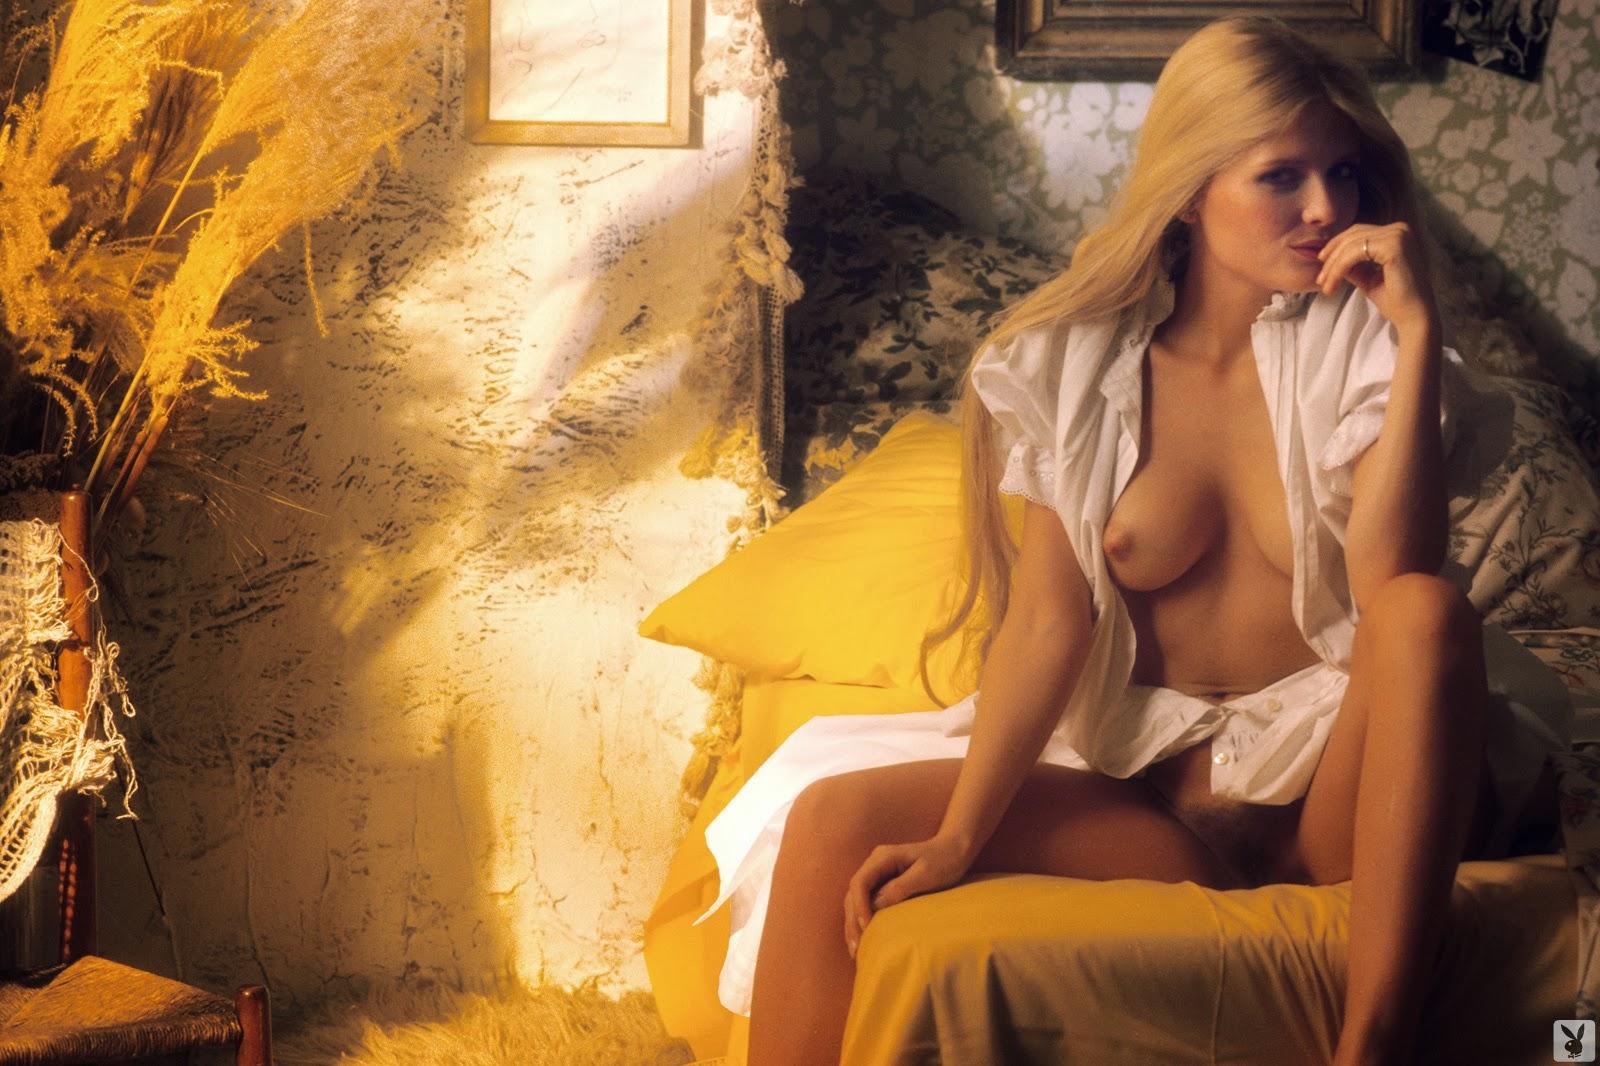 Diy breasts huge - 3 6